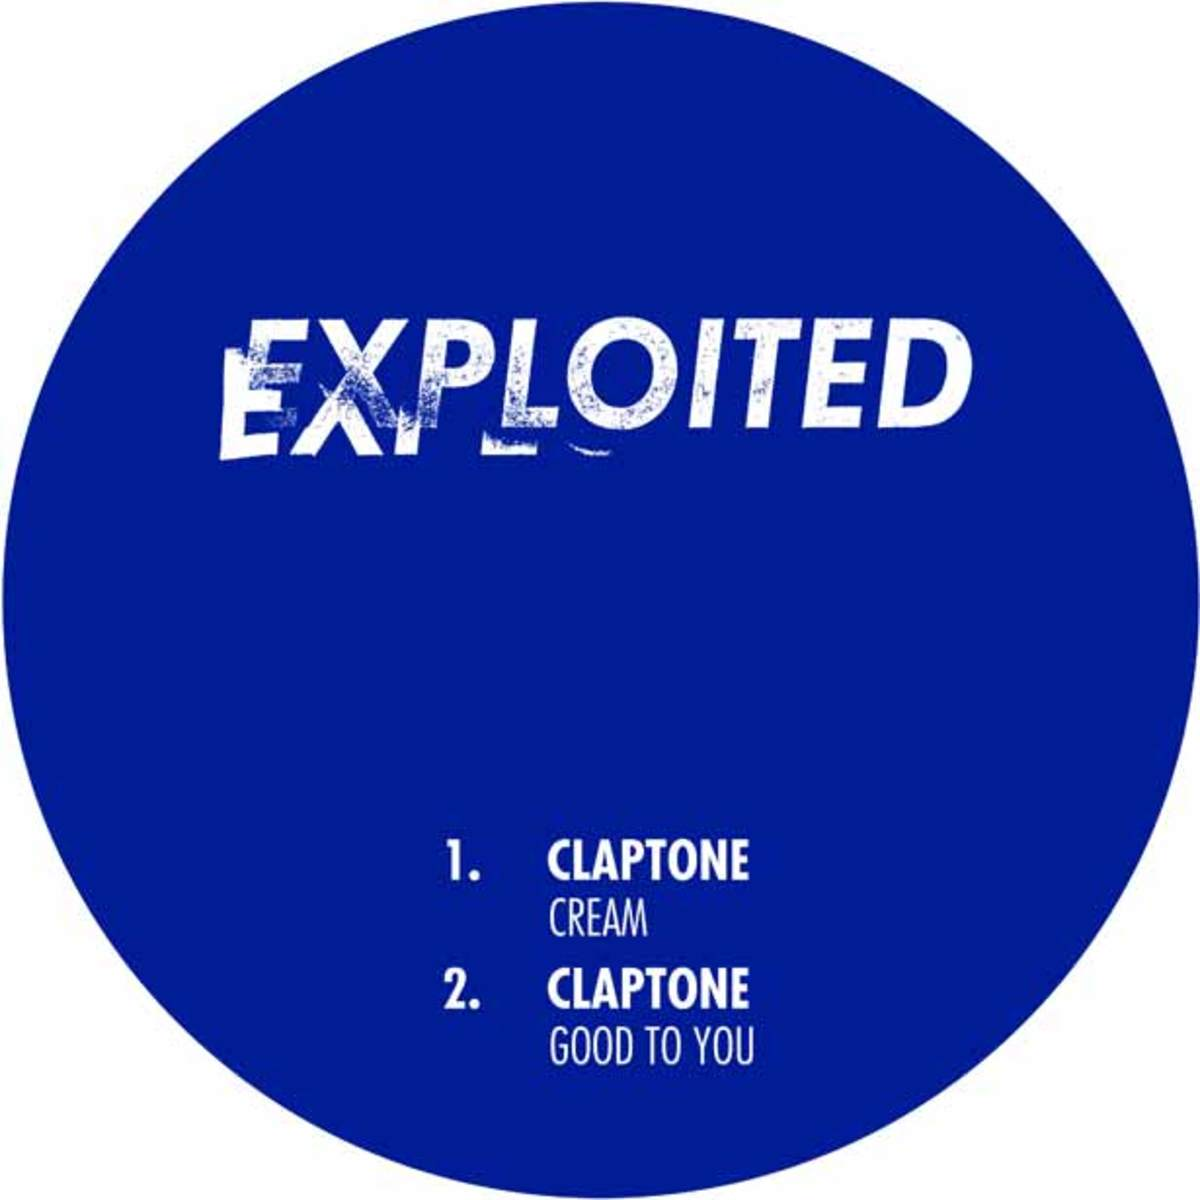 claptone.cream